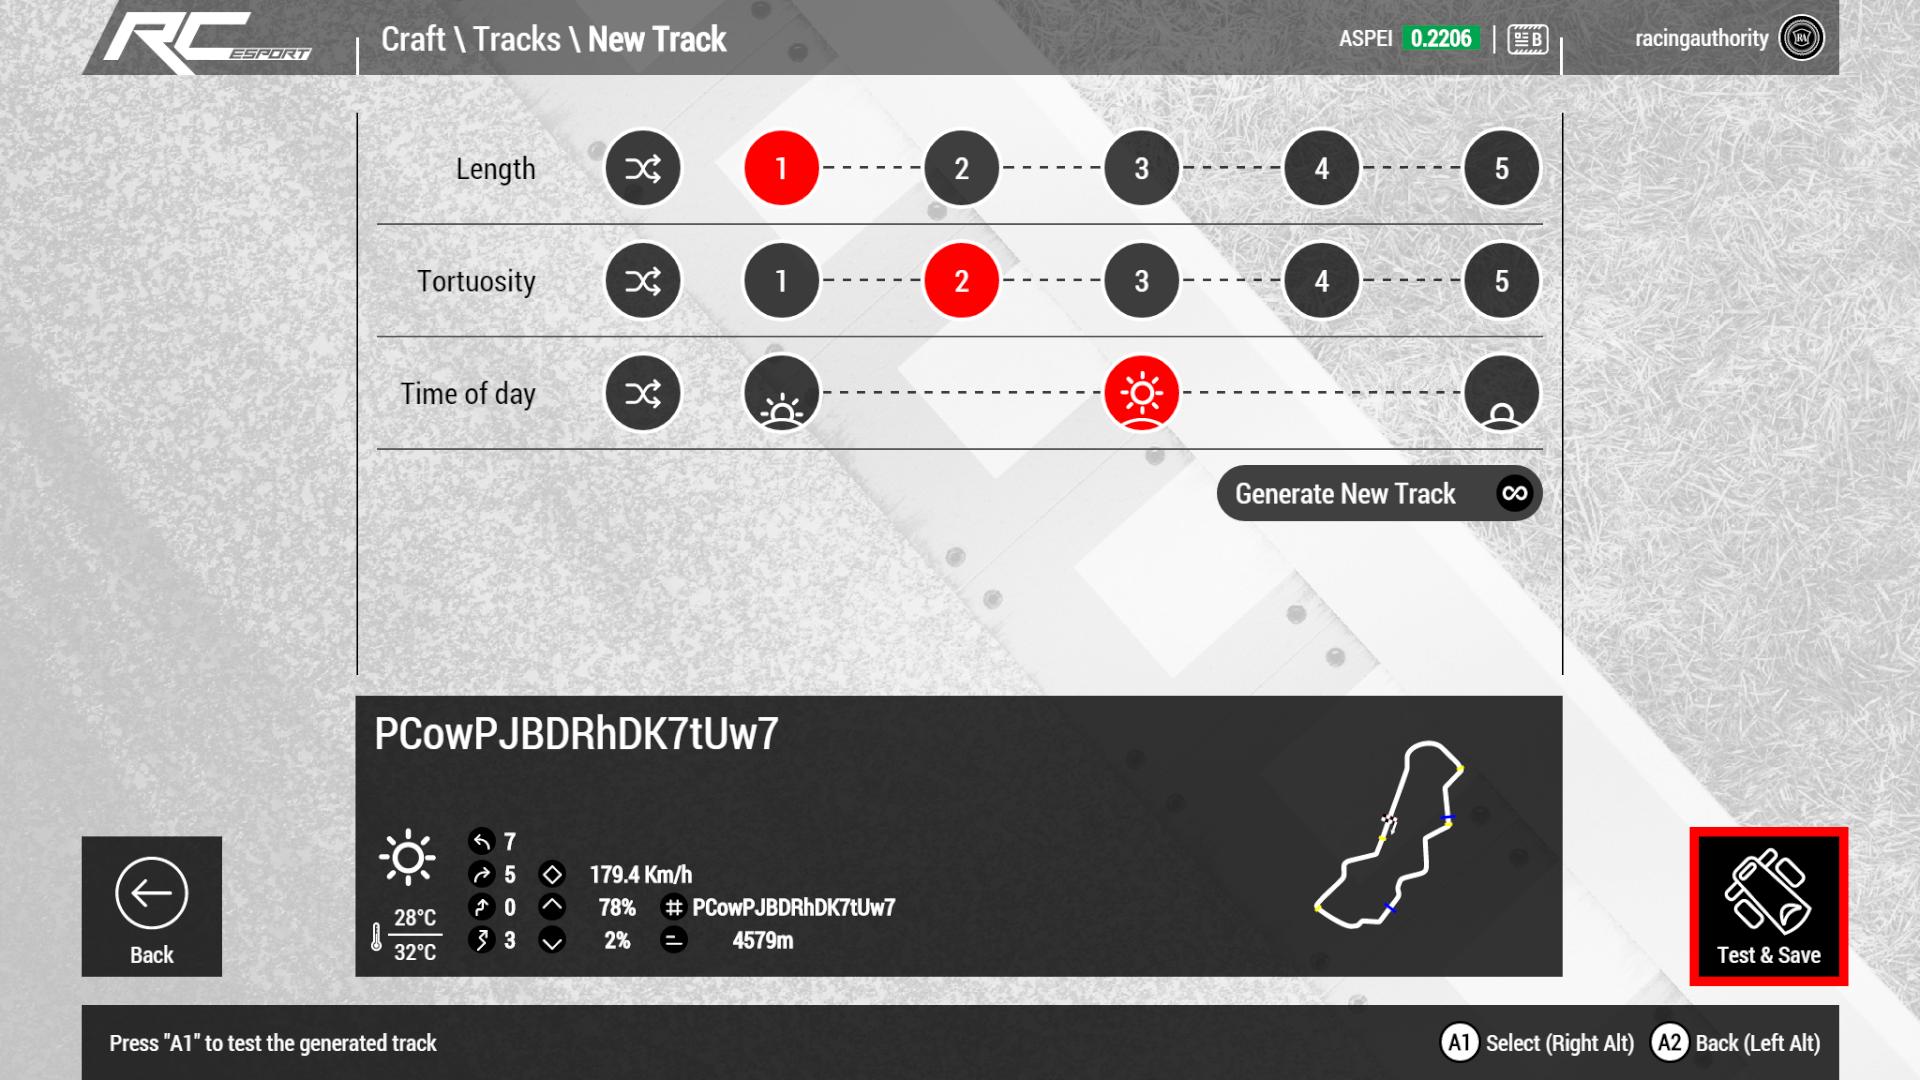 B_Craft_03_Tracks_B